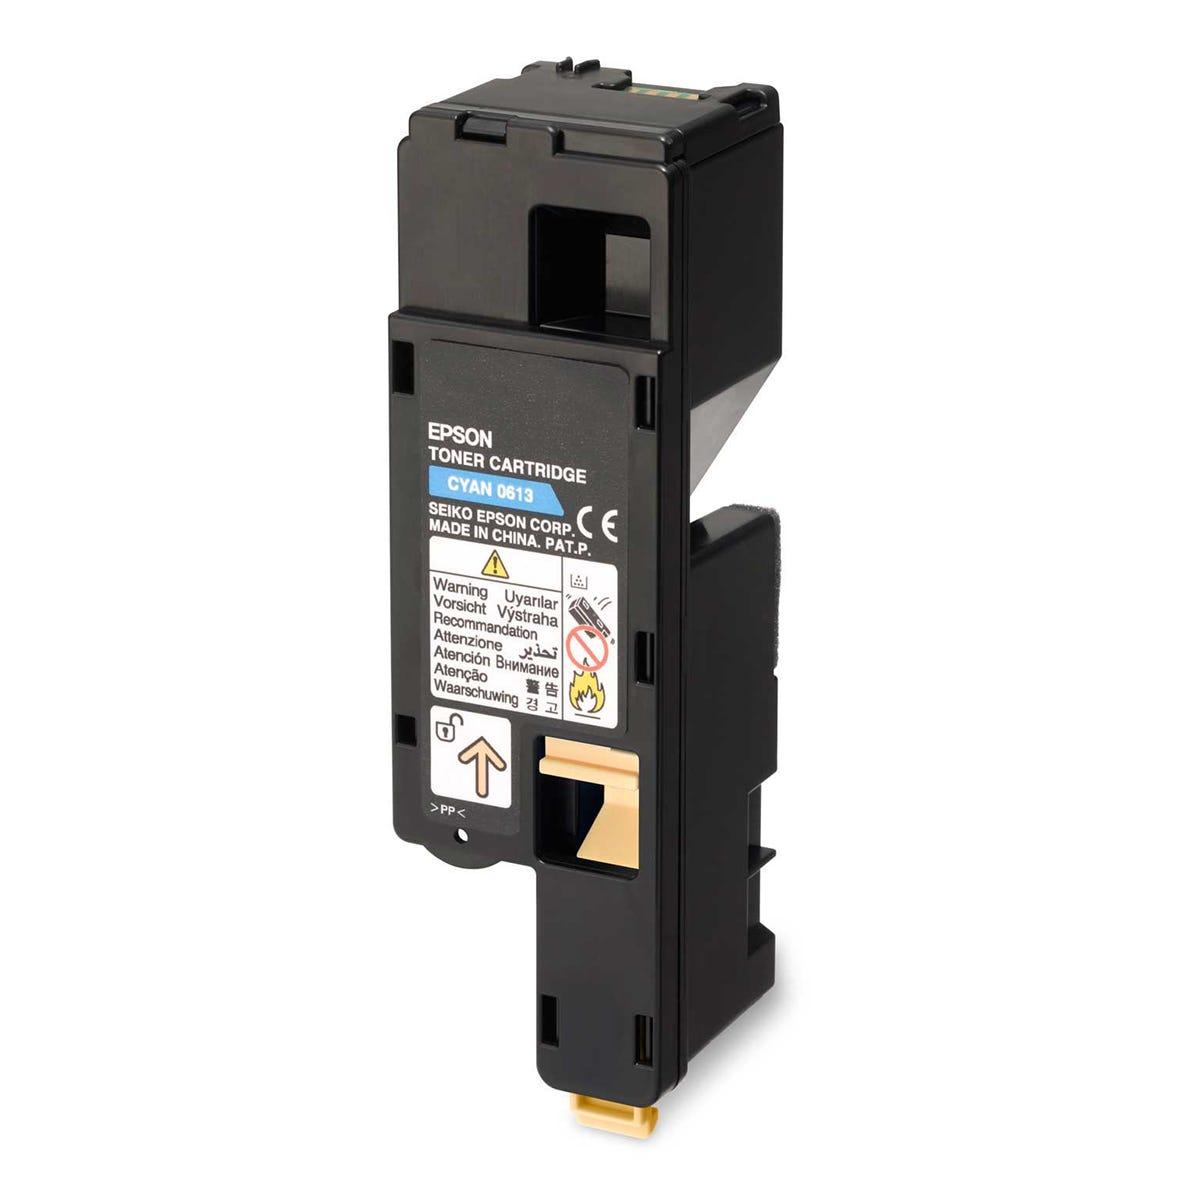 Epson Aculaser C1700 Toner Cartridge High Yield, Cyan.